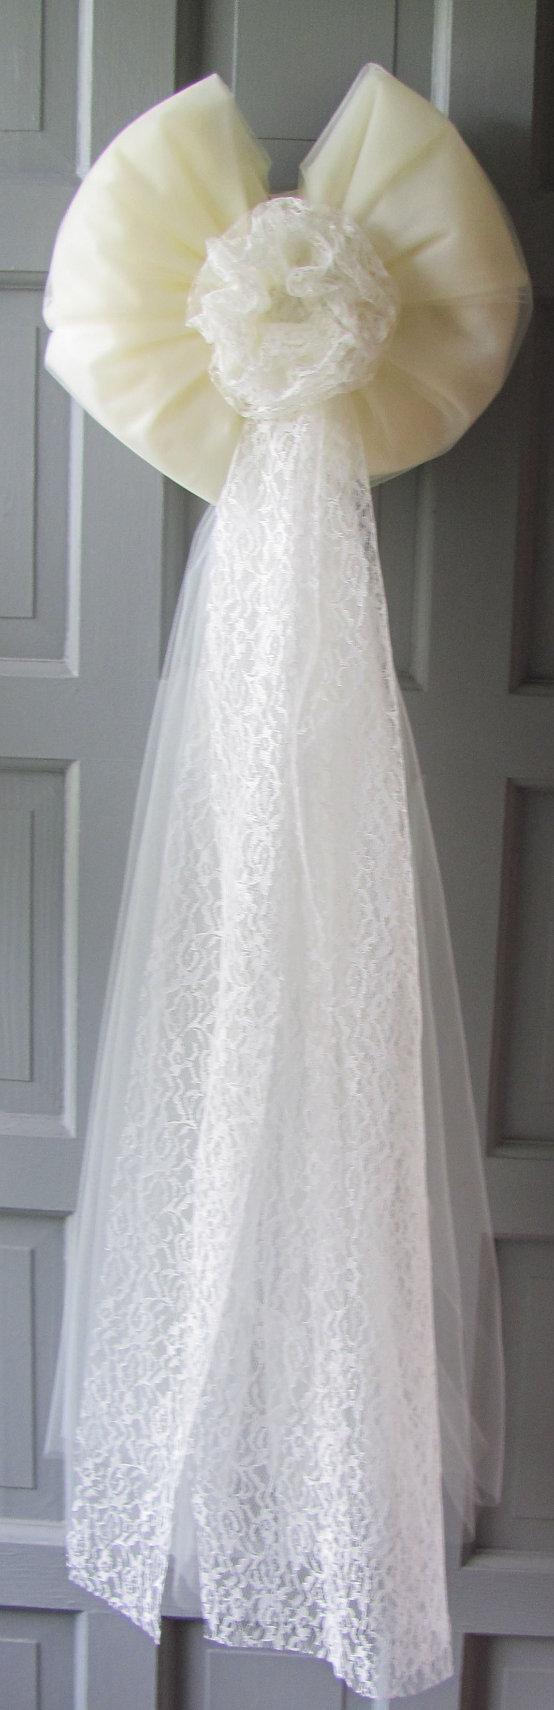 Wedding Bows Decorations For Wedding Aisle By Flowerfilledweddings